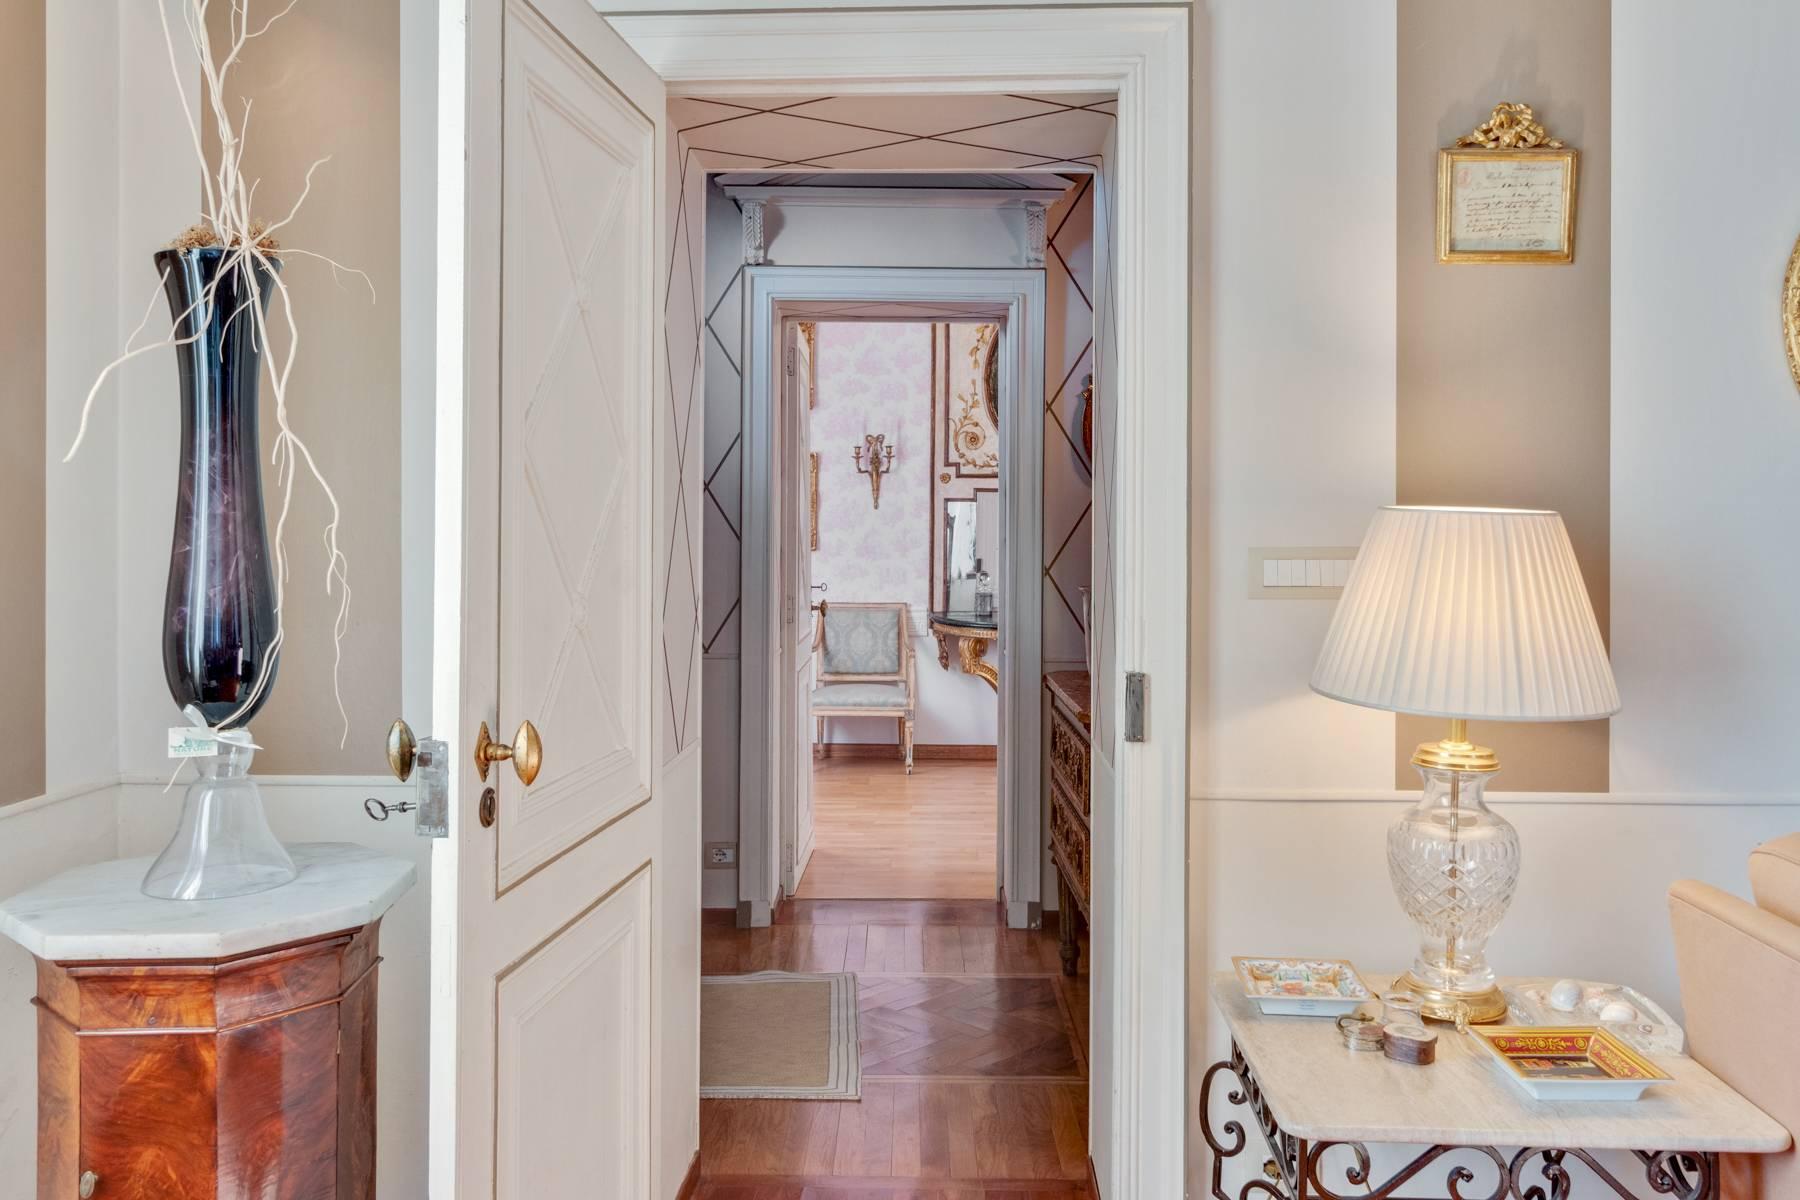 Casa indipendente in Vendita a Torino: 5 locali, 270 mq - Foto 6